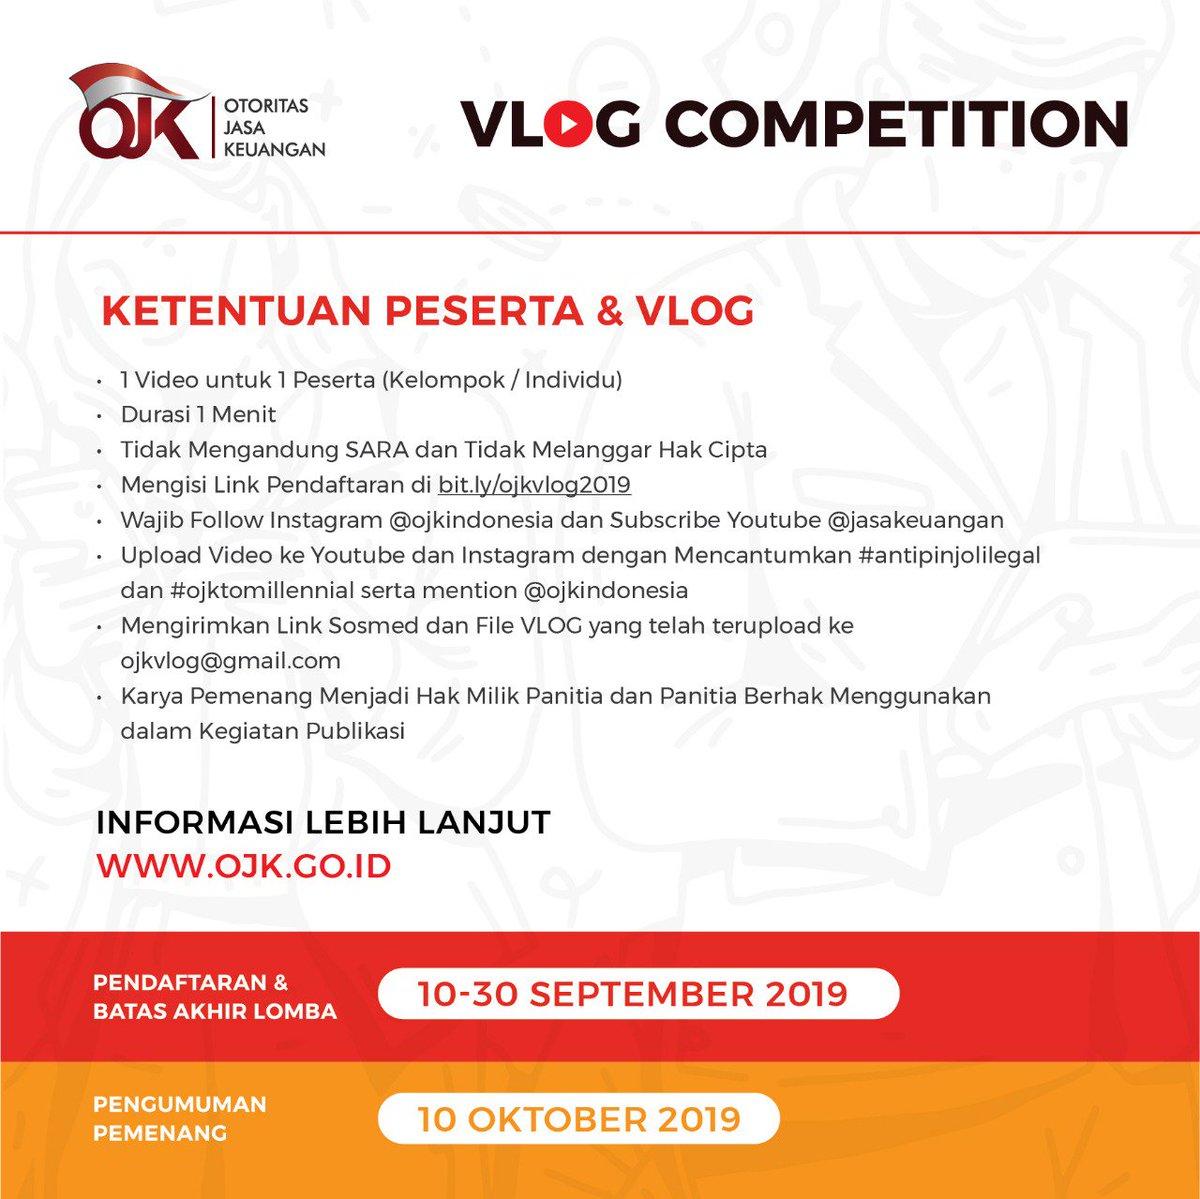 Ojk Indonesia On Twitter Halo Sobat Ojk Sdh Daftar Lomba Vlog